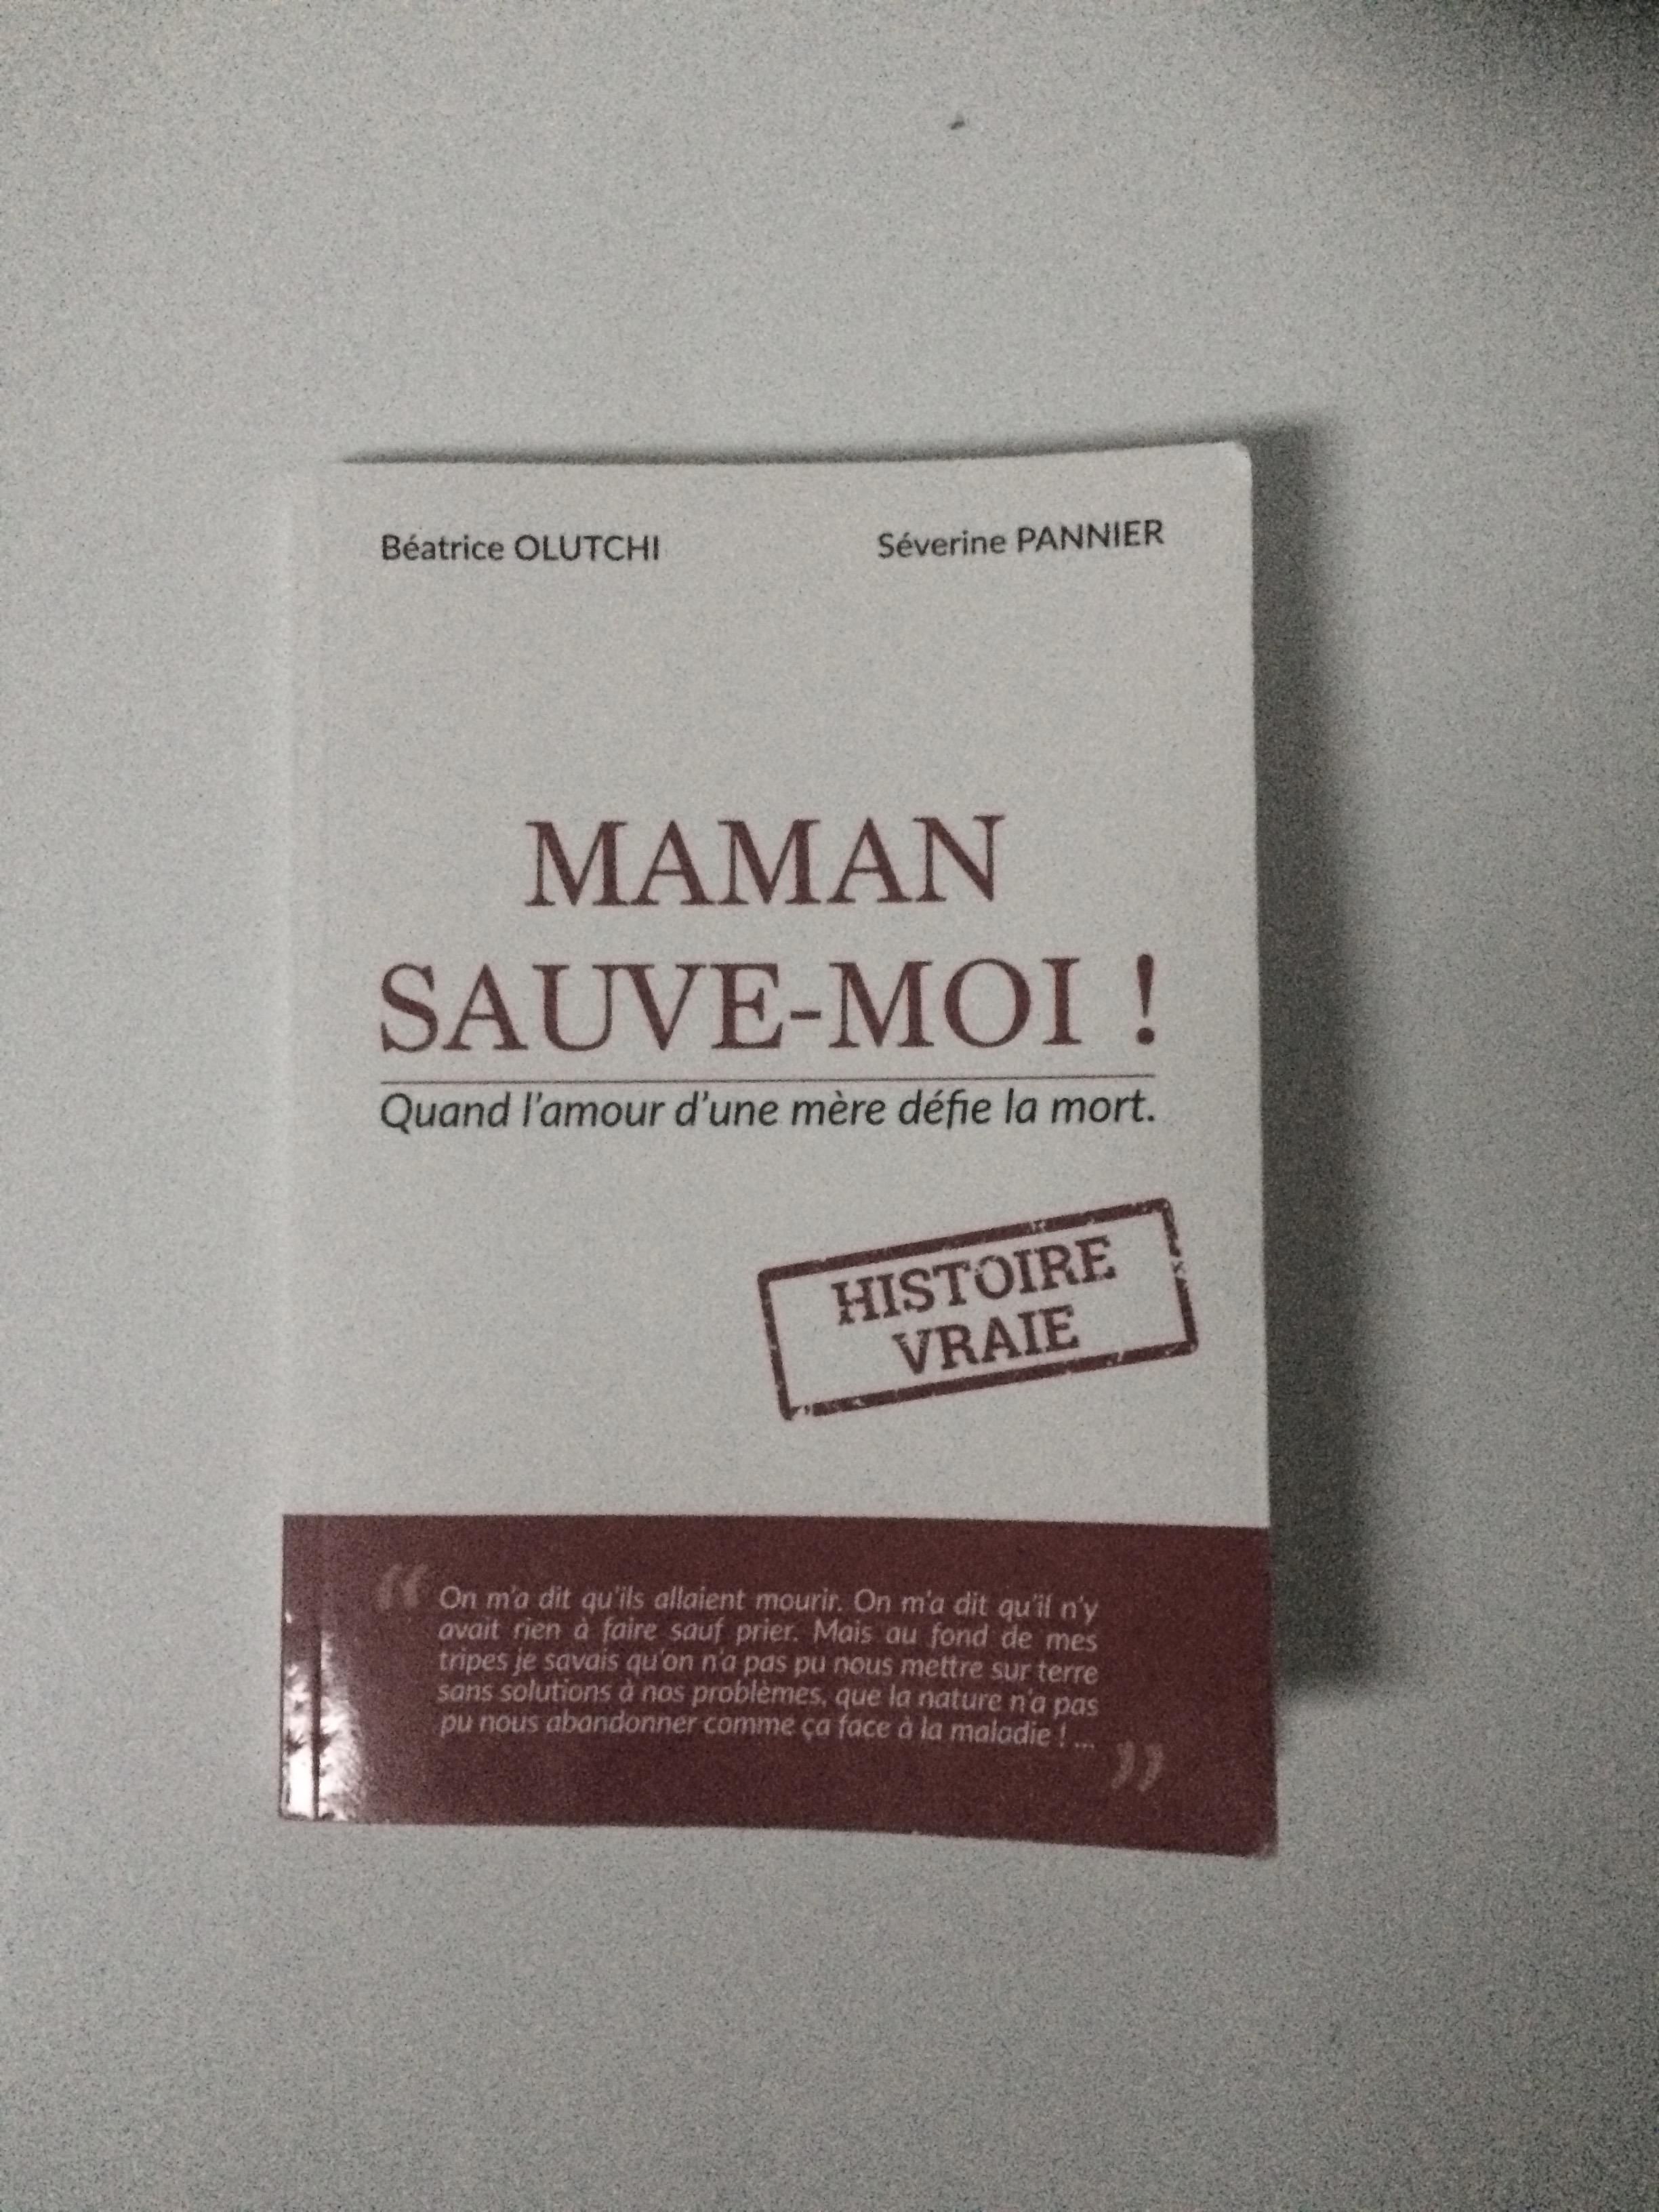 MAMAN SAUVE-MOI !